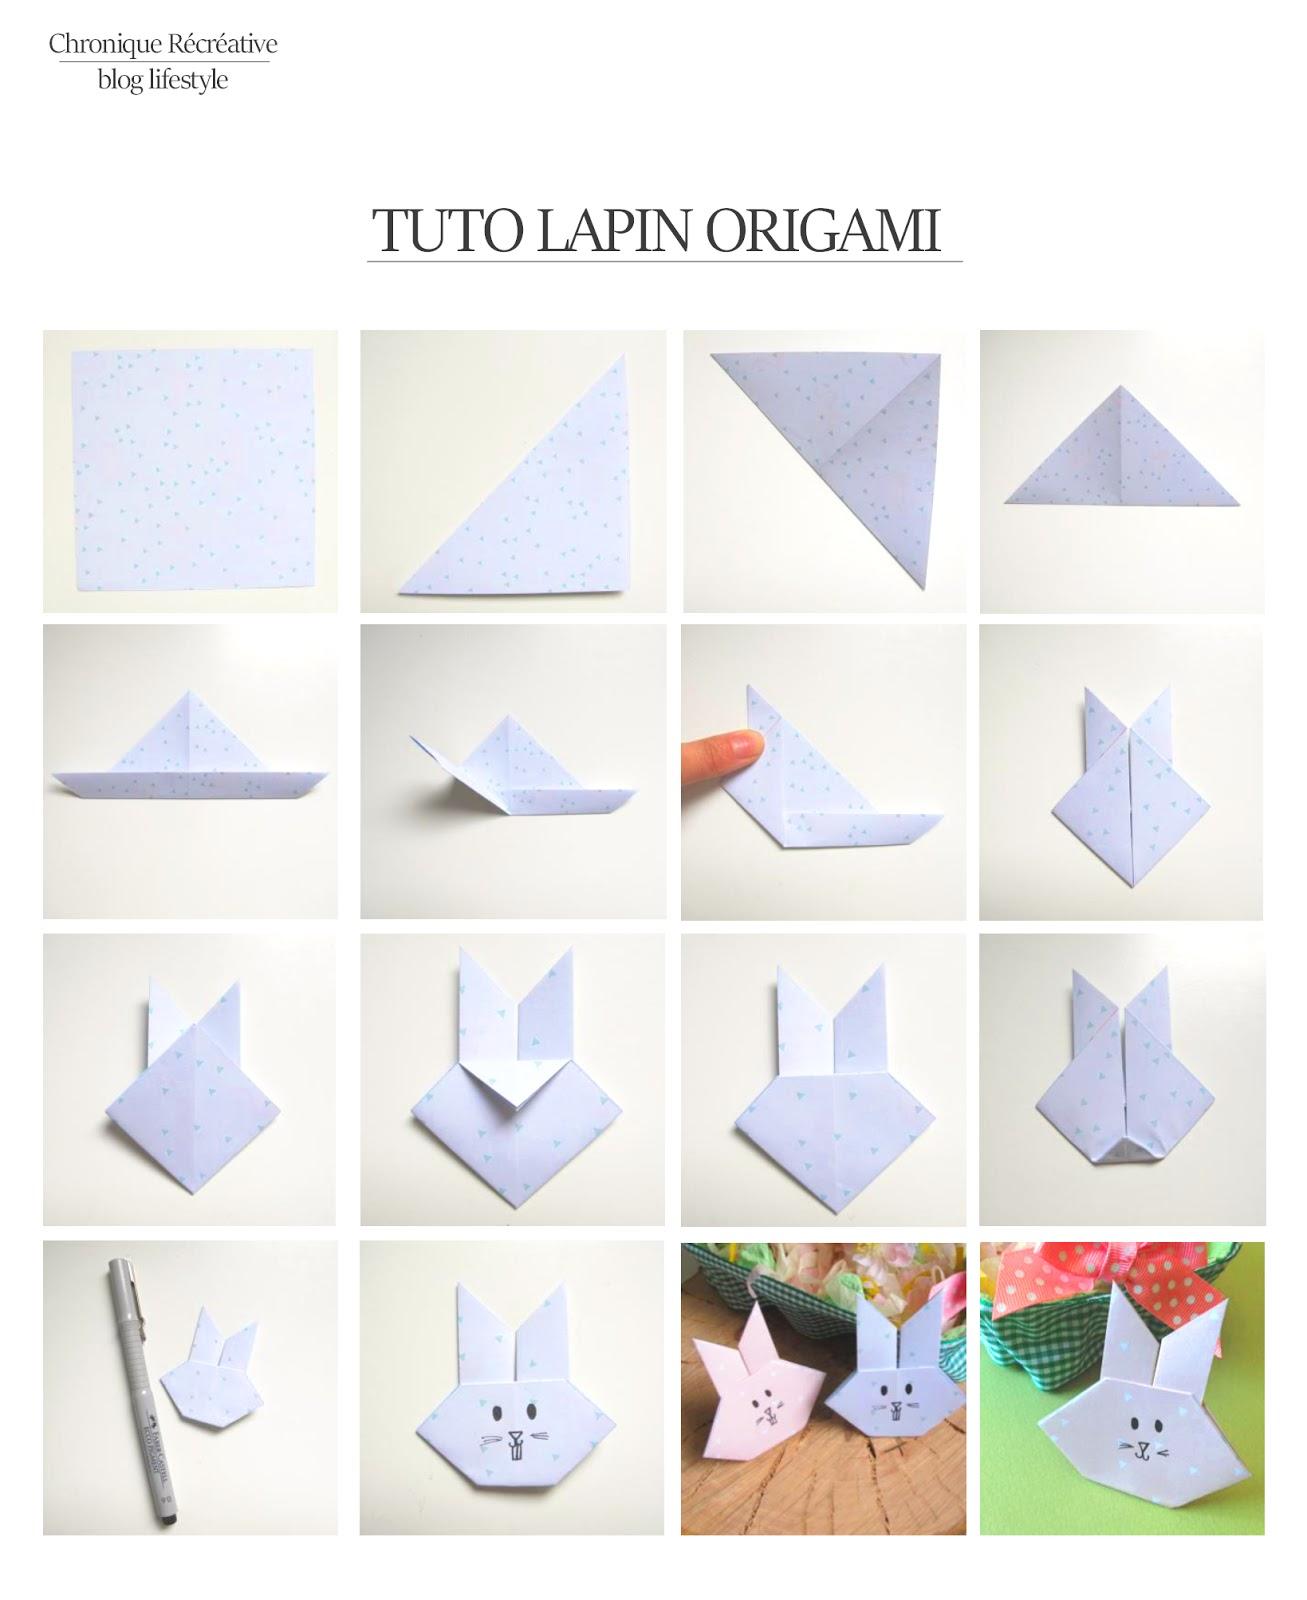 chronique r cr ative tuto lapin origami de paques. Black Bedroom Furniture Sets. Home Design Ideas